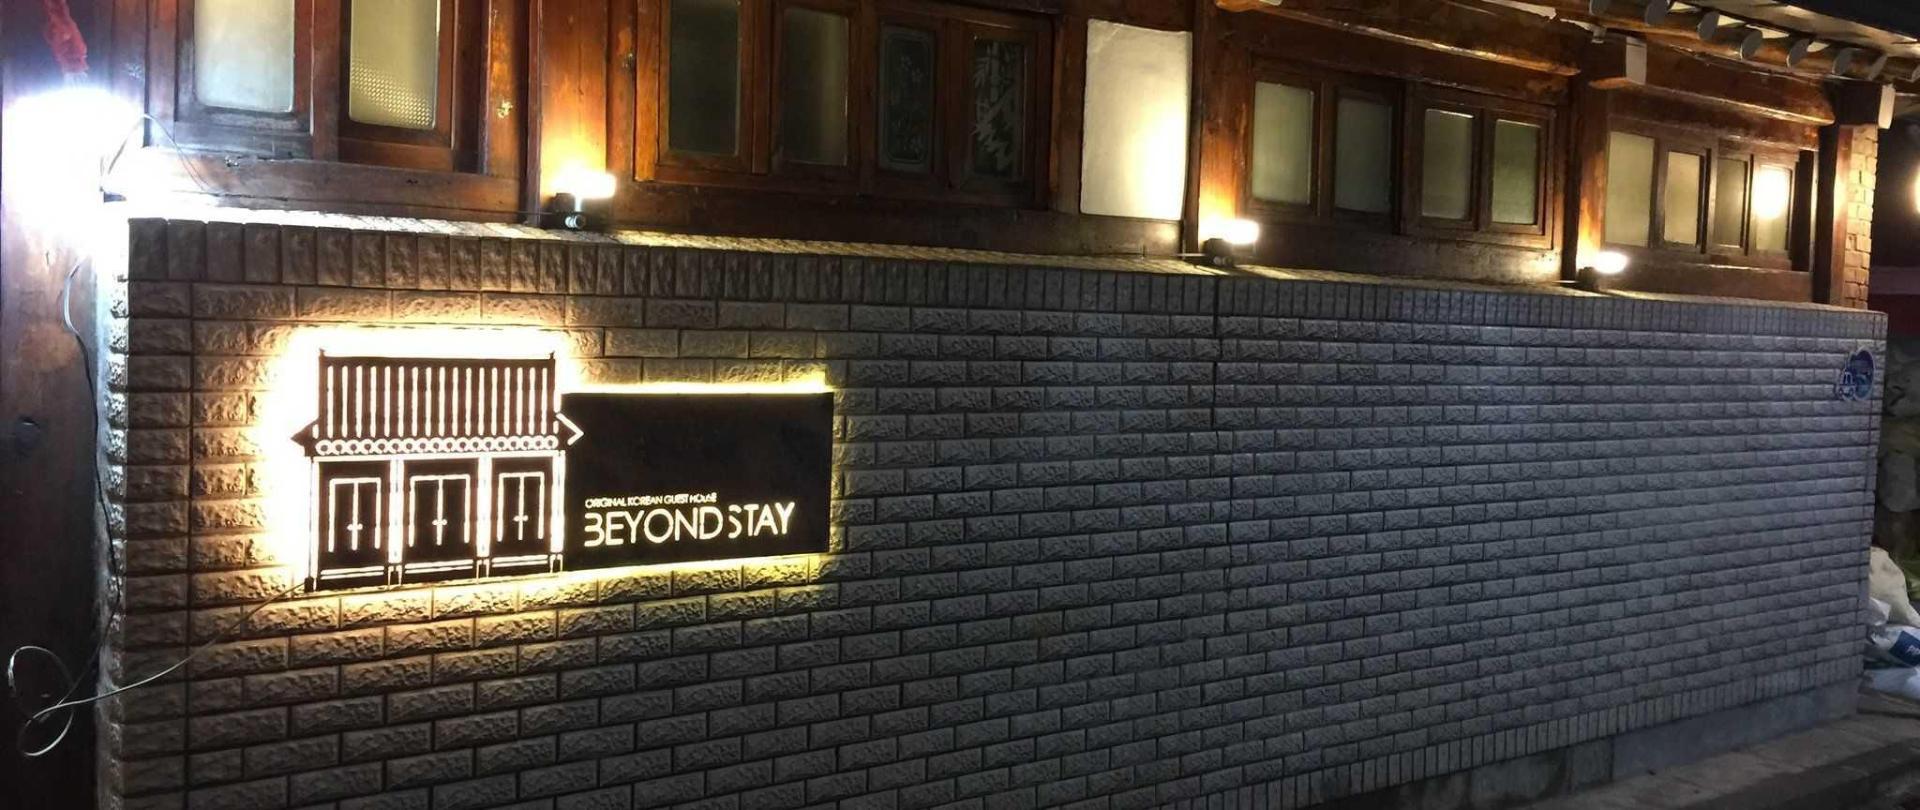 beyond-stay-1.jpg